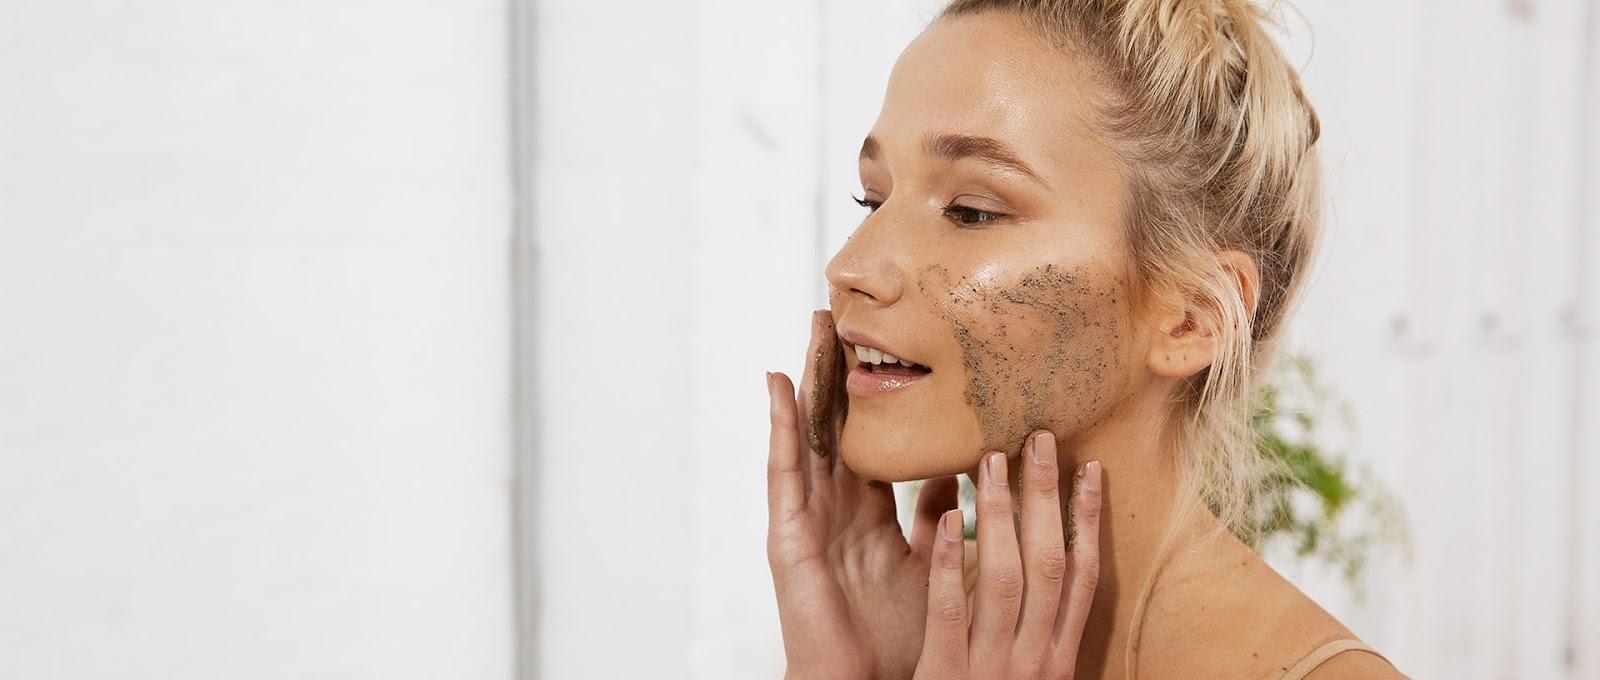 Skin Facial Scrub 104